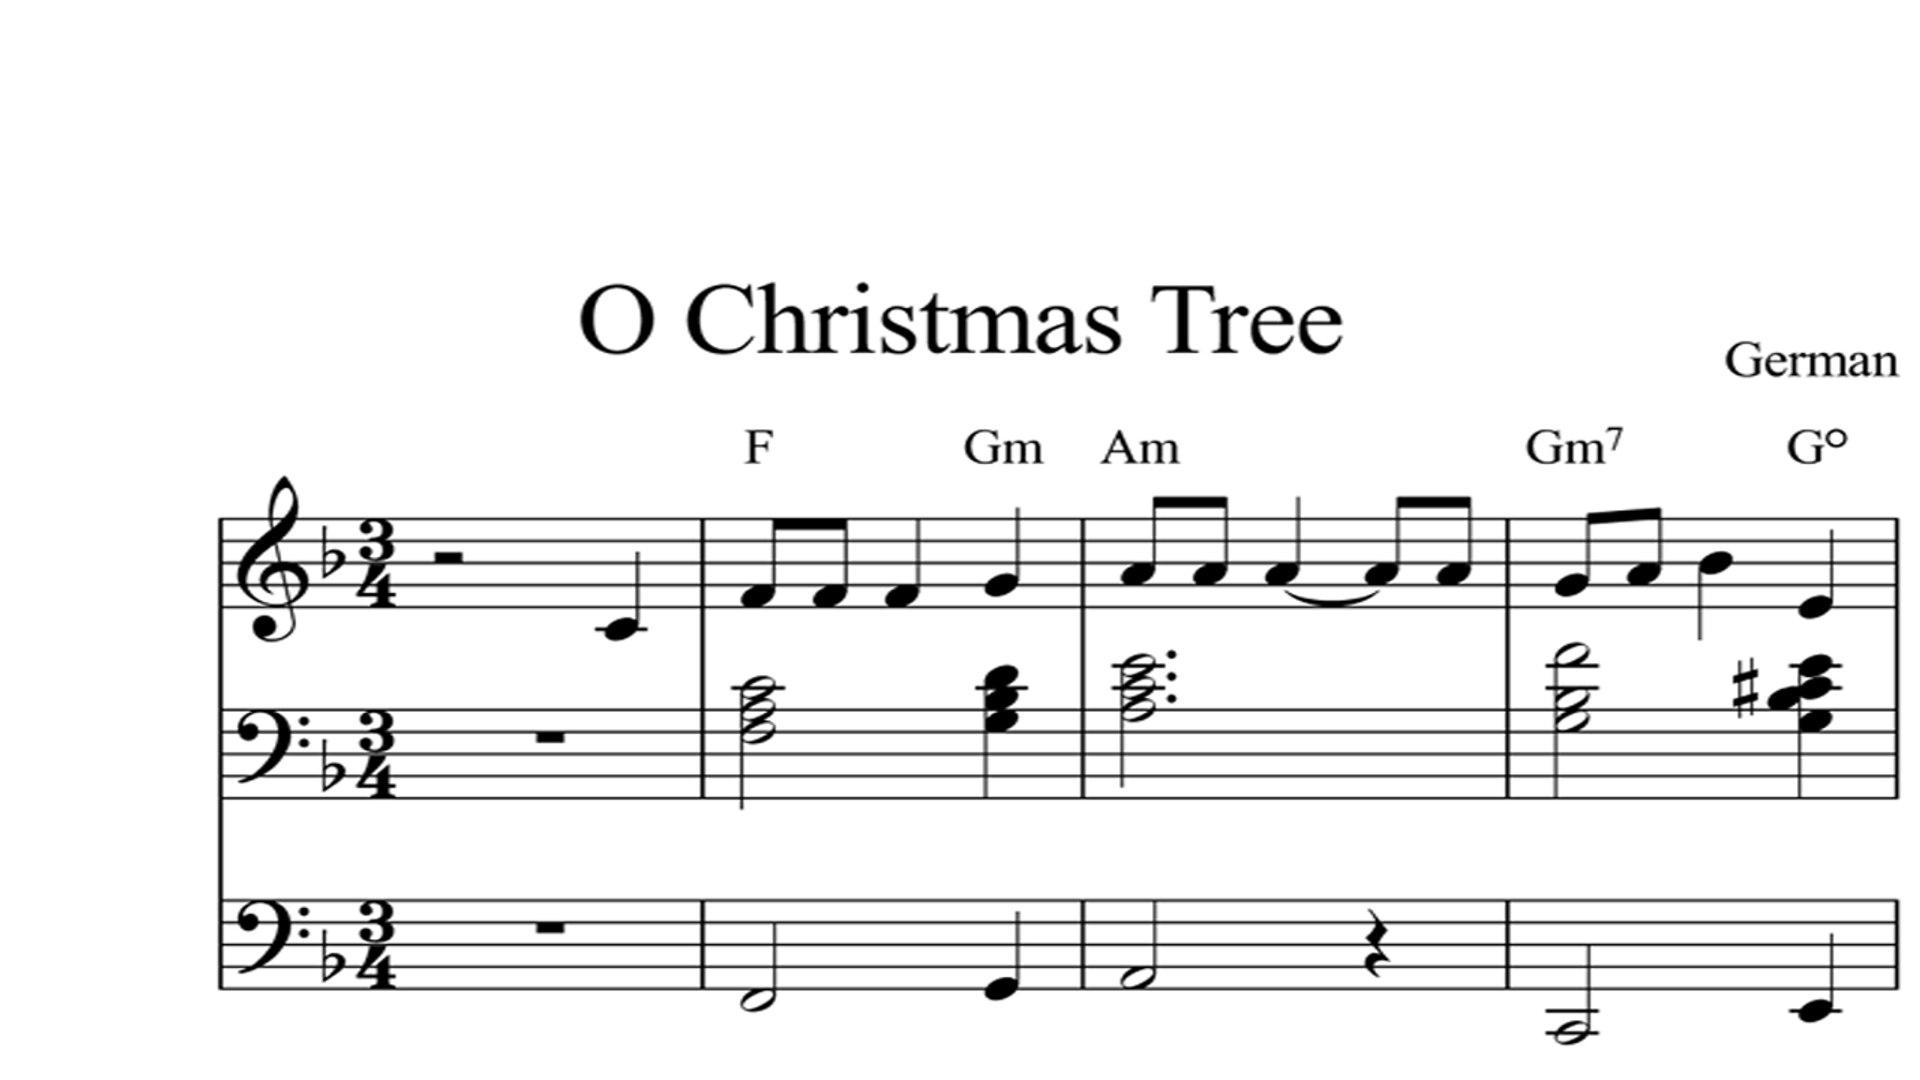 O Christmas Tree In German.O Christmas Tree Digital Sheet Music Piano Organ Keyboard Book 2